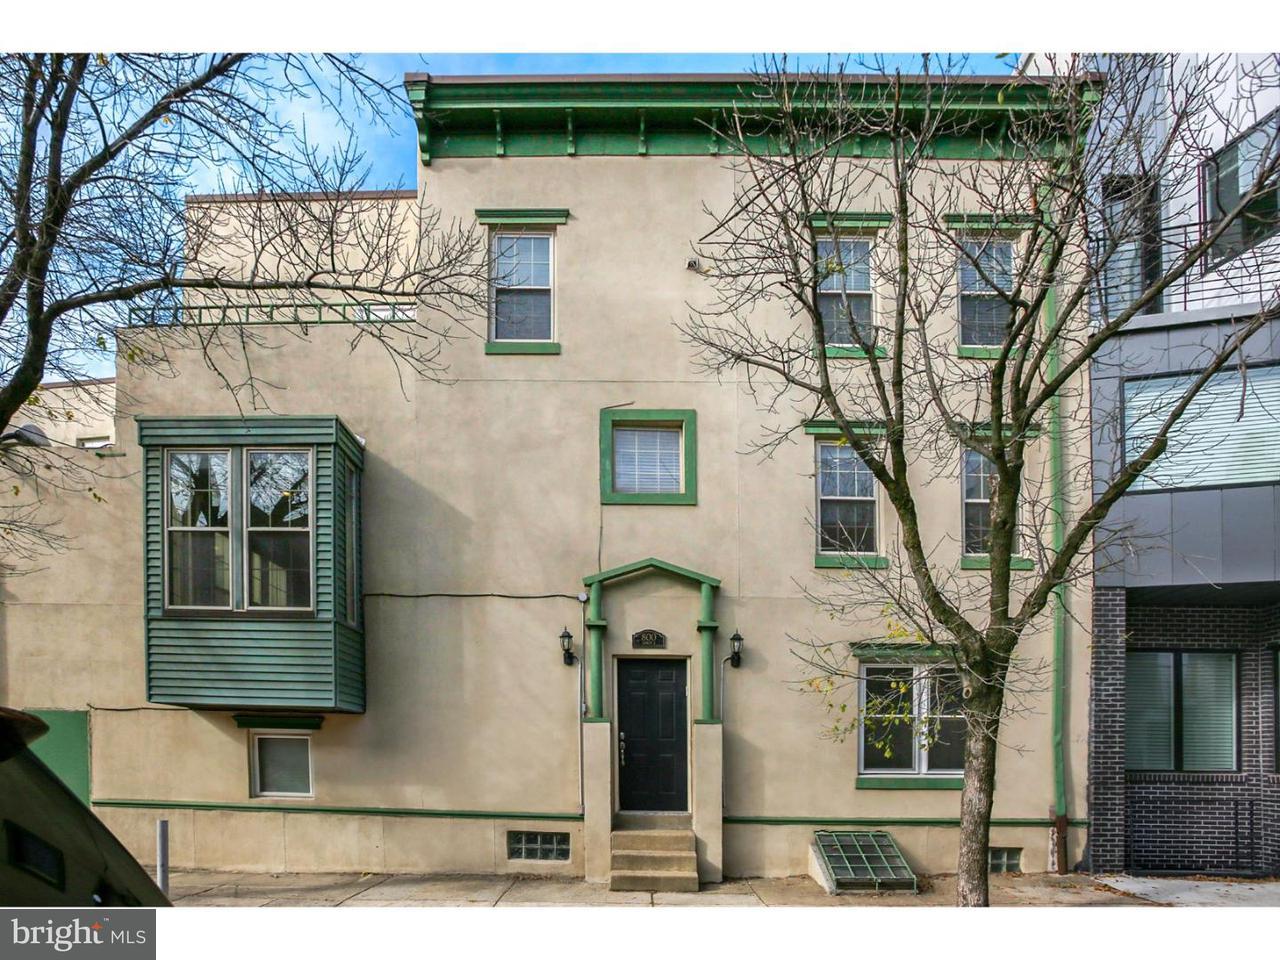 800 N Lawrence Philadelphia , PA 19123